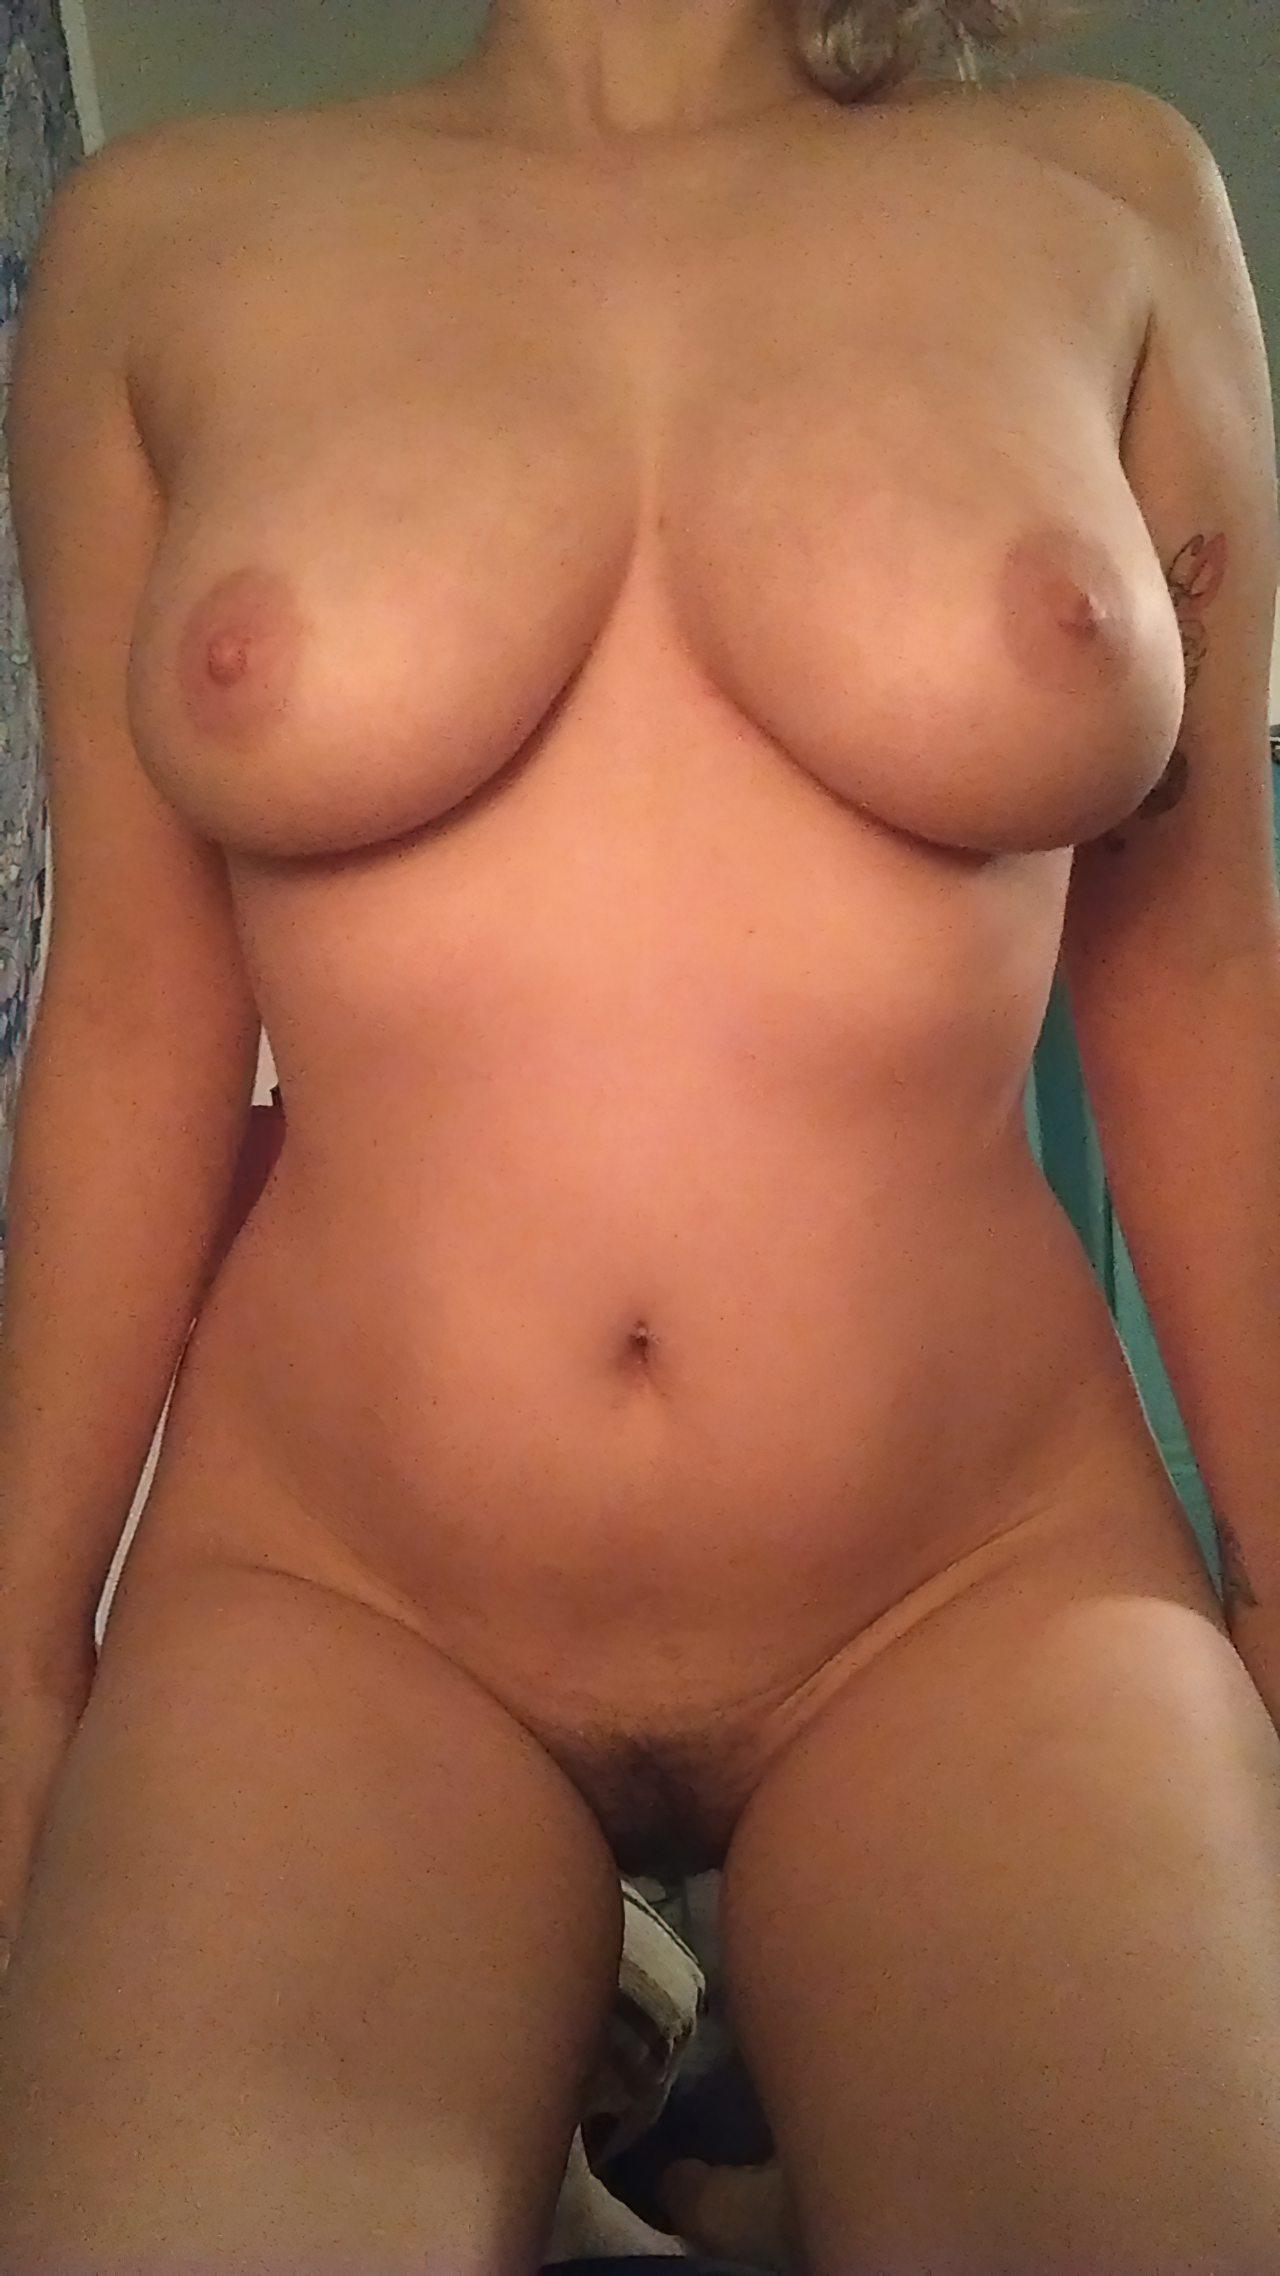 Fotos Mulher Nua (7)